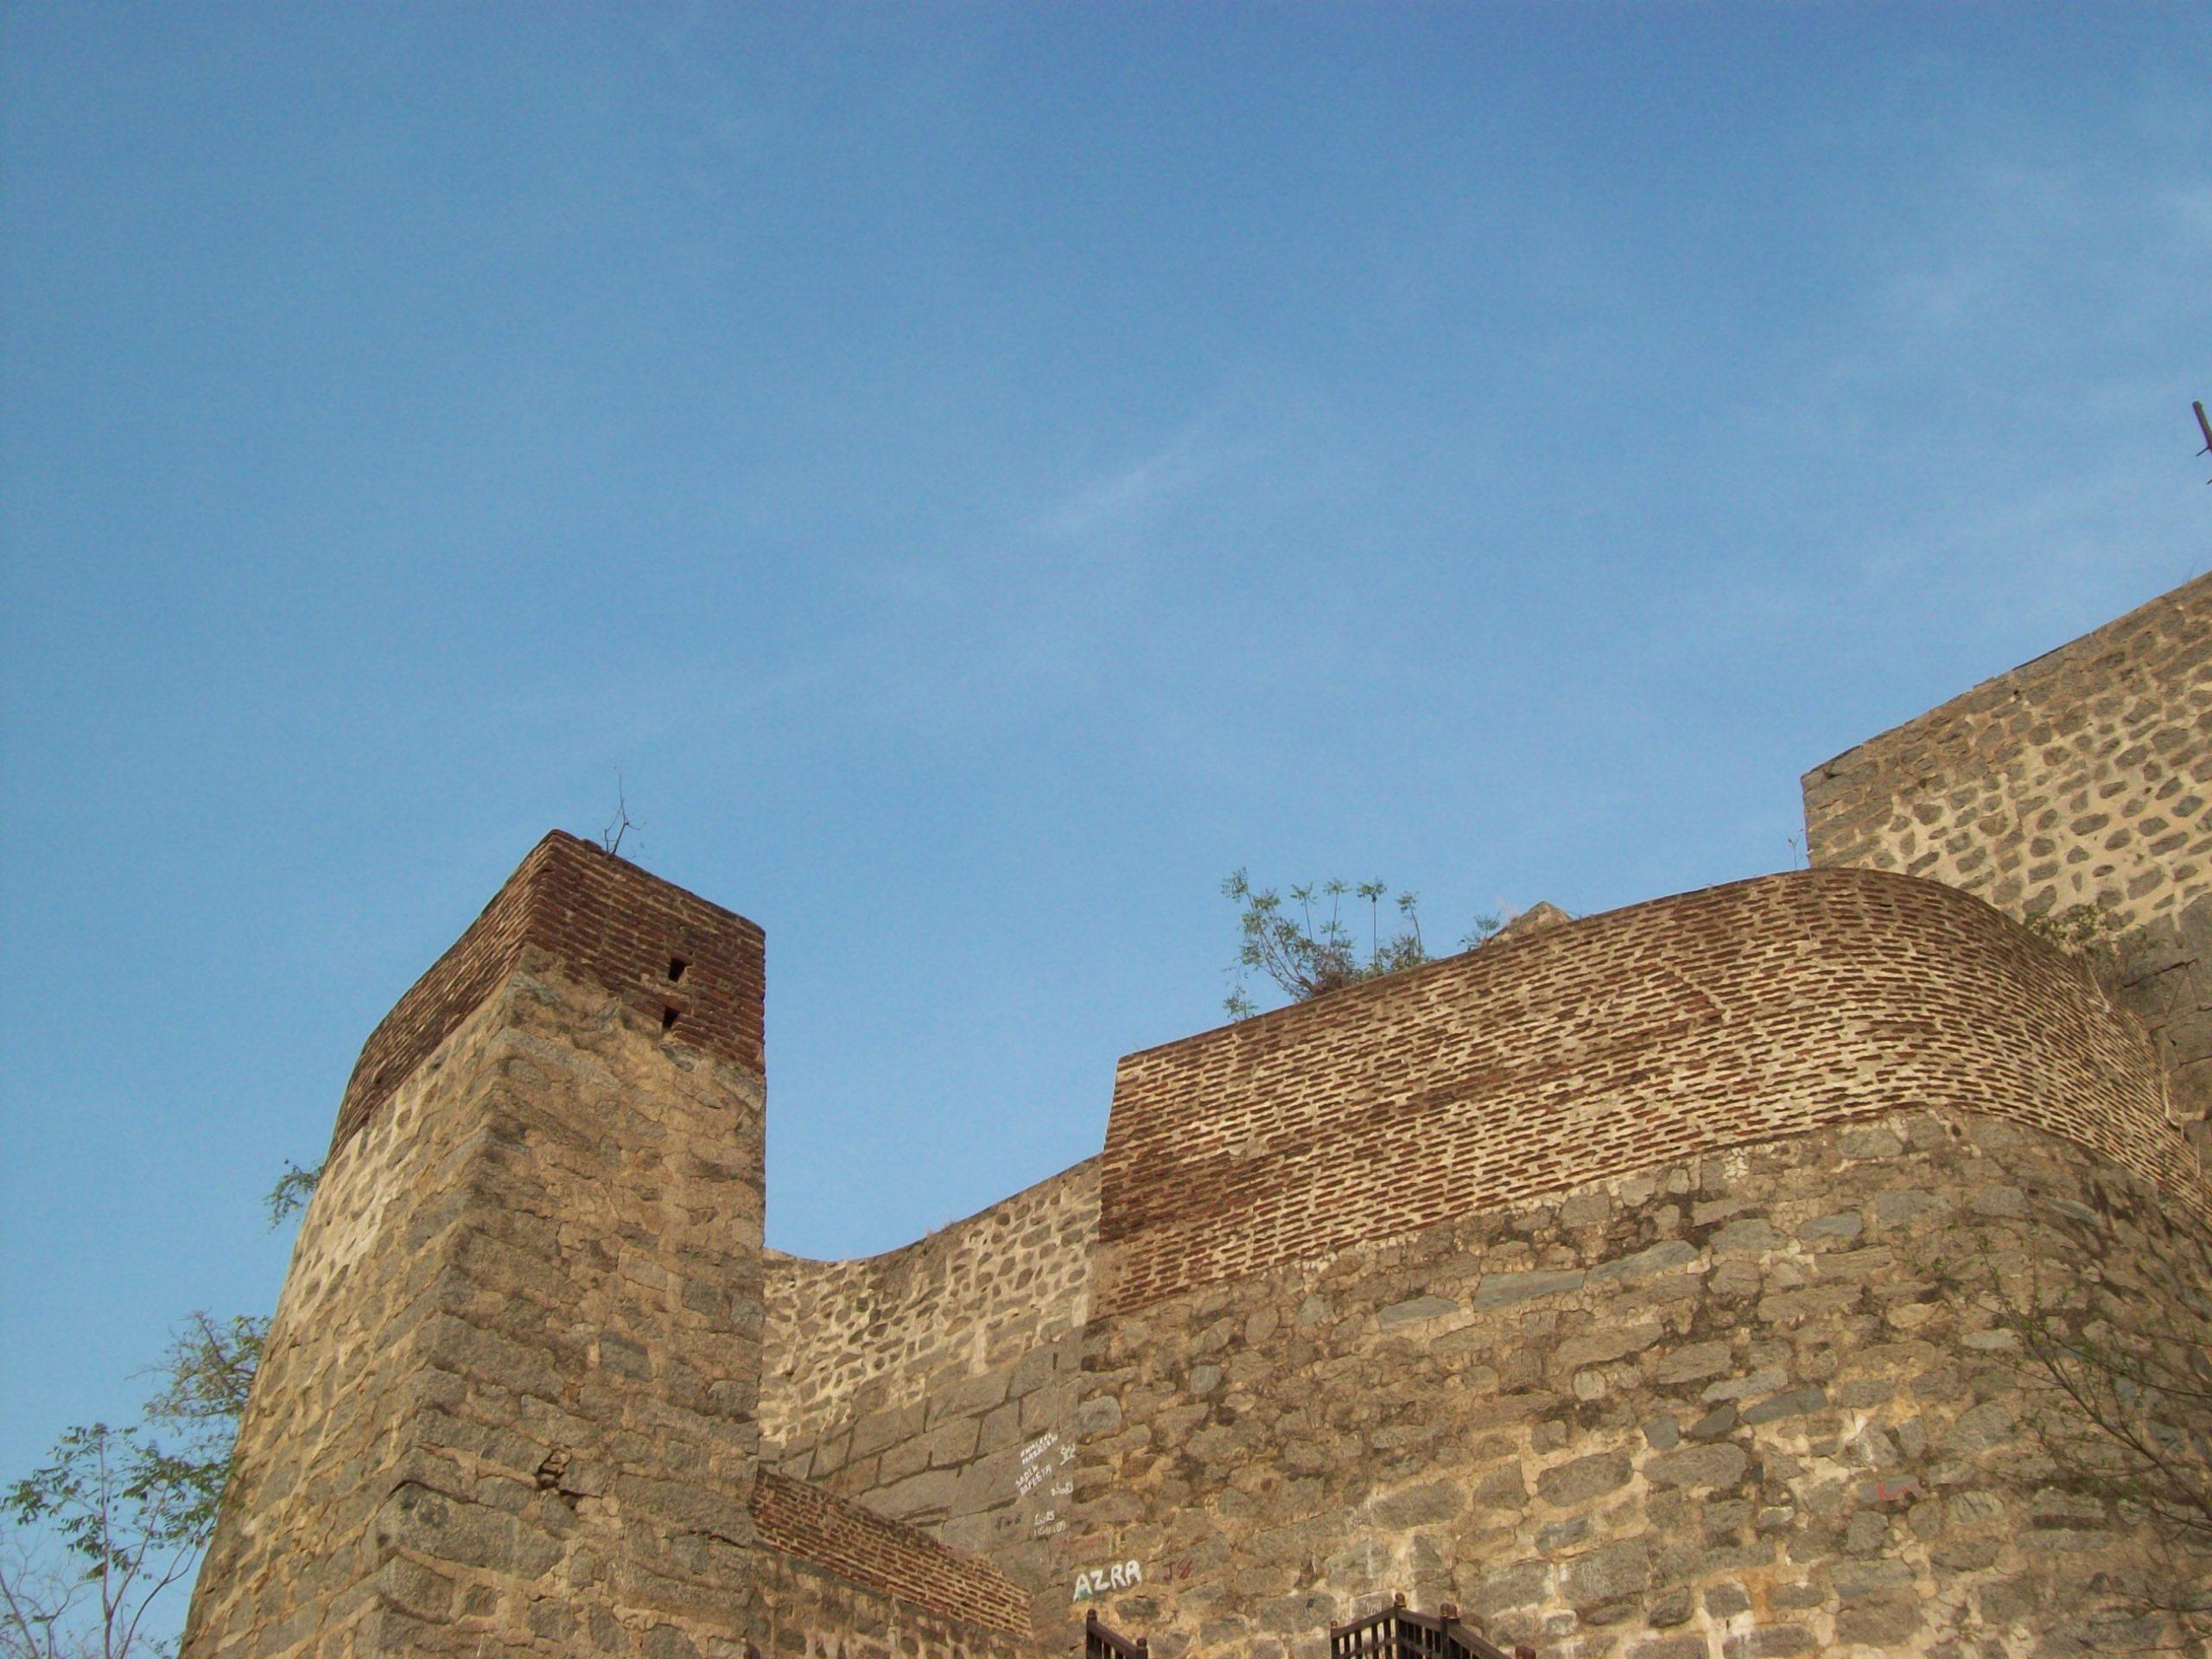 Best Place To Visit in Telangana-Khammam Fort, Khammam